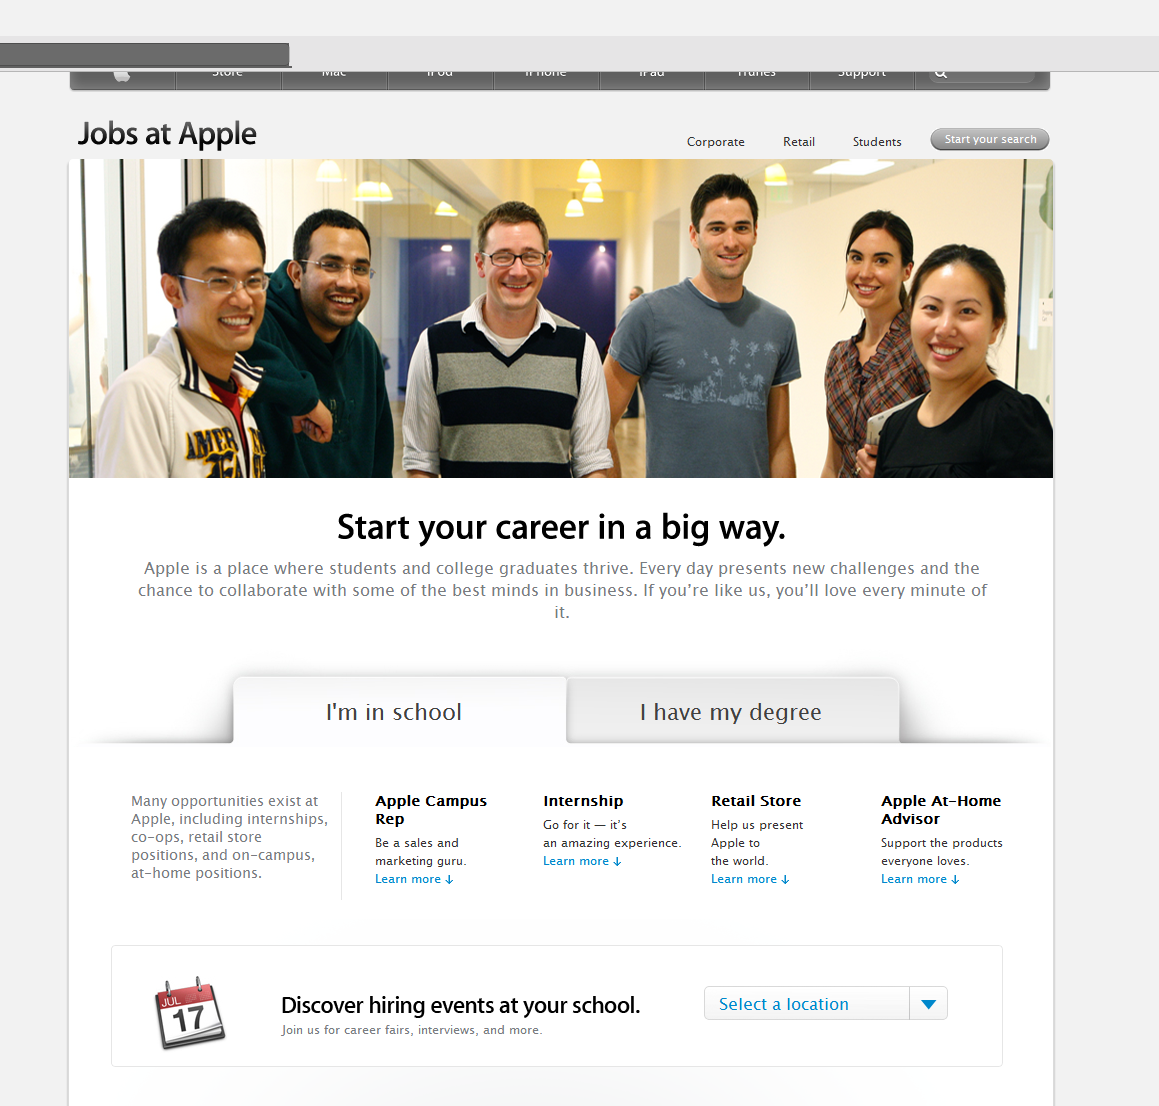 Apple At Home Advisor Work At Home Program Job For College